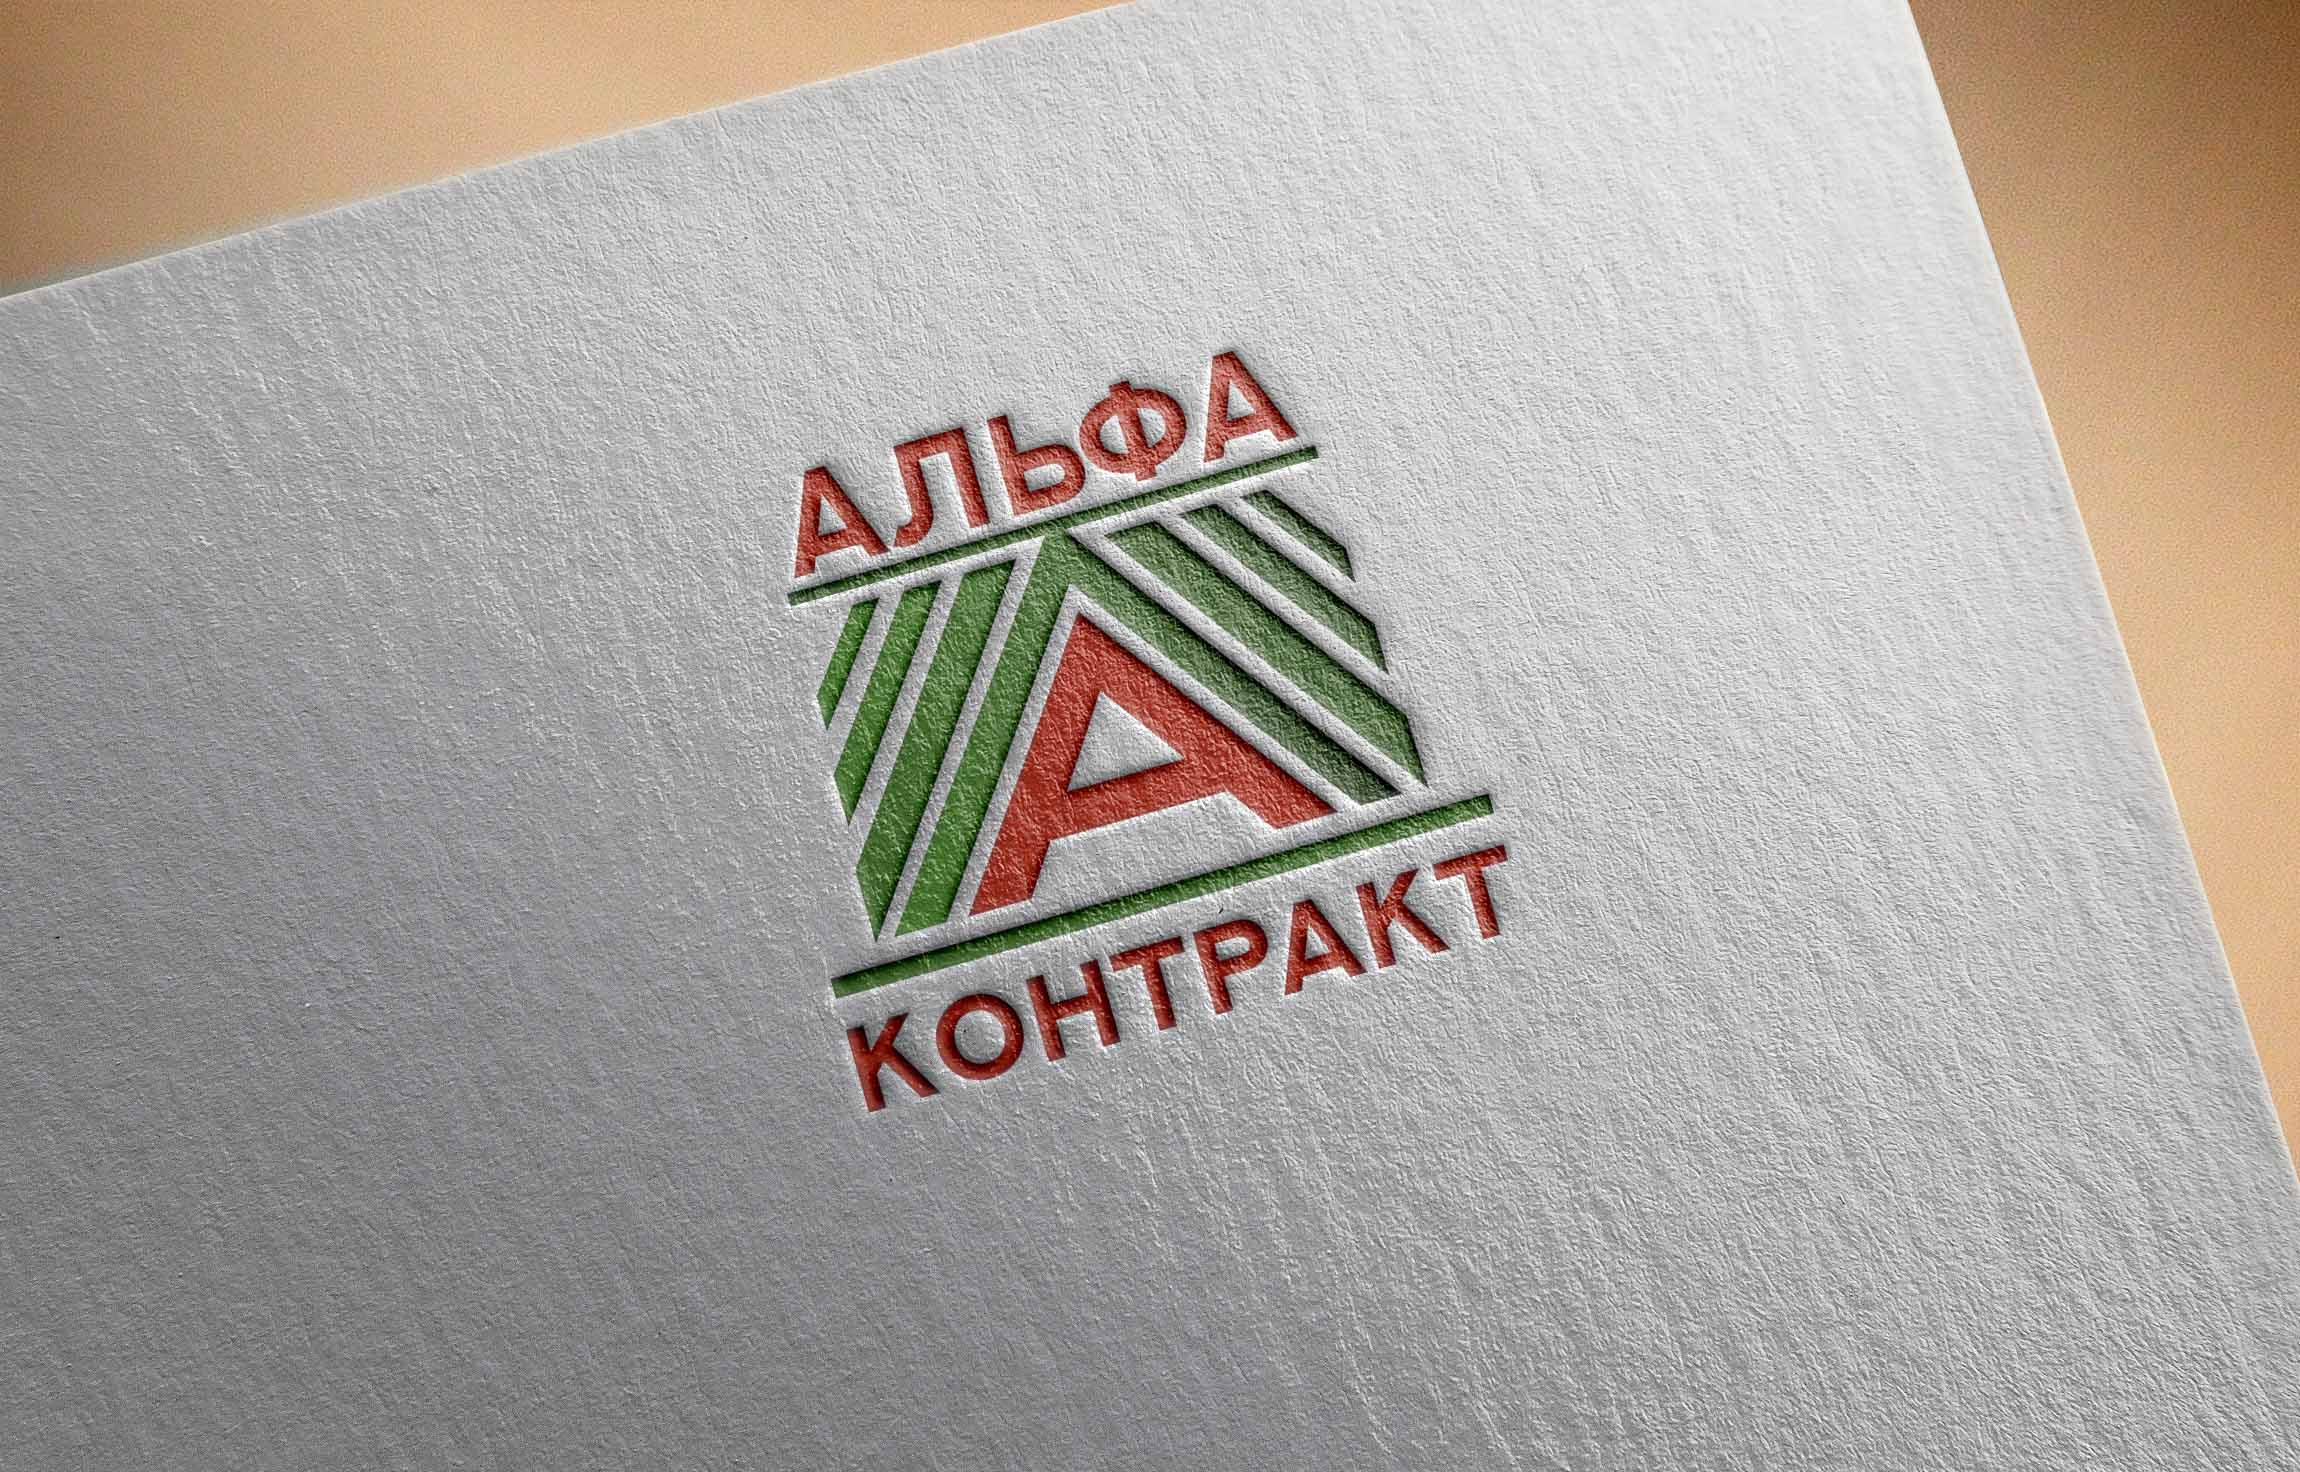 Дизайнер для разработки логотипа компании фото f_0105bf8203f341e5.jpg